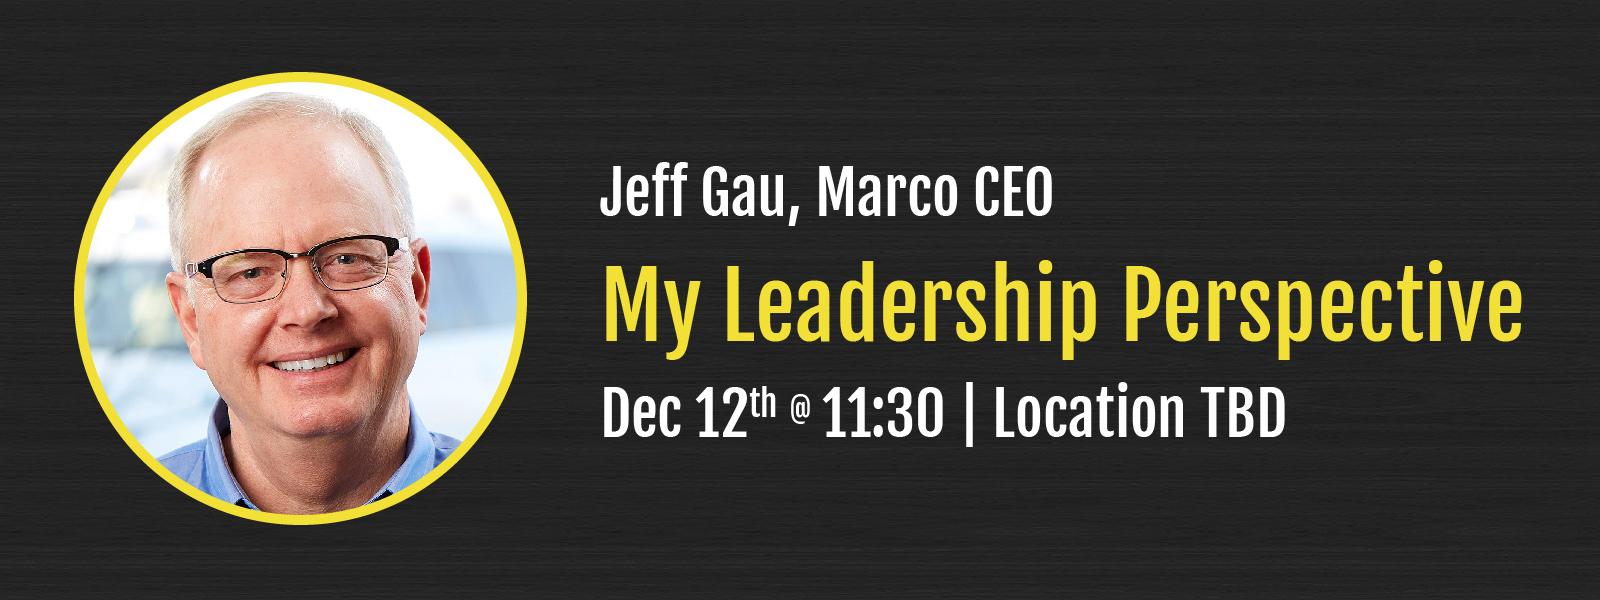 Jeff Gau: My Leadership Perspective